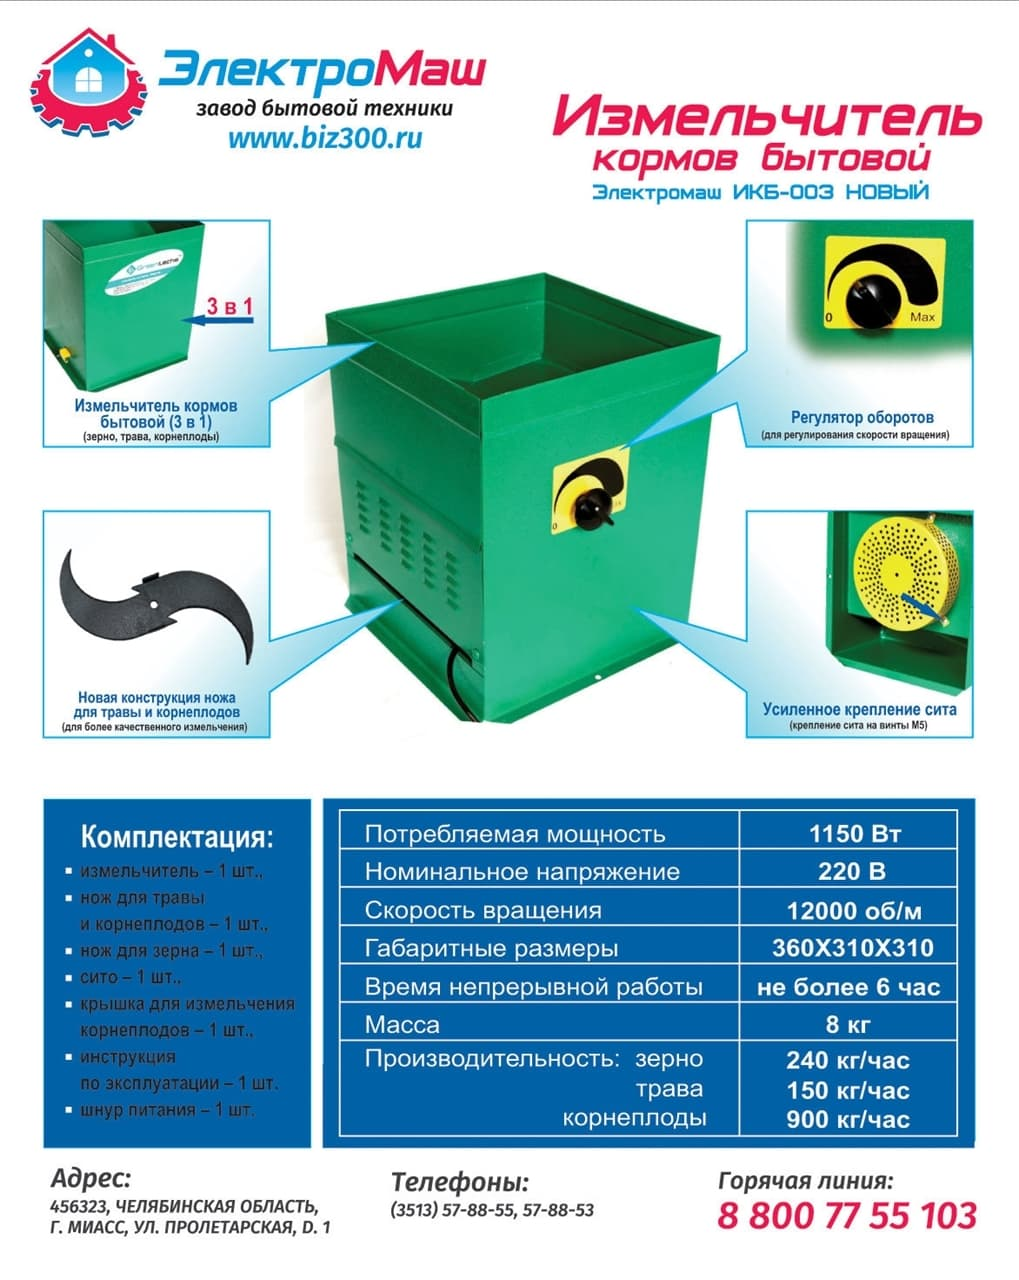 Зернодробилка+траворезка+корморезка ИКБ-003 Электромаш